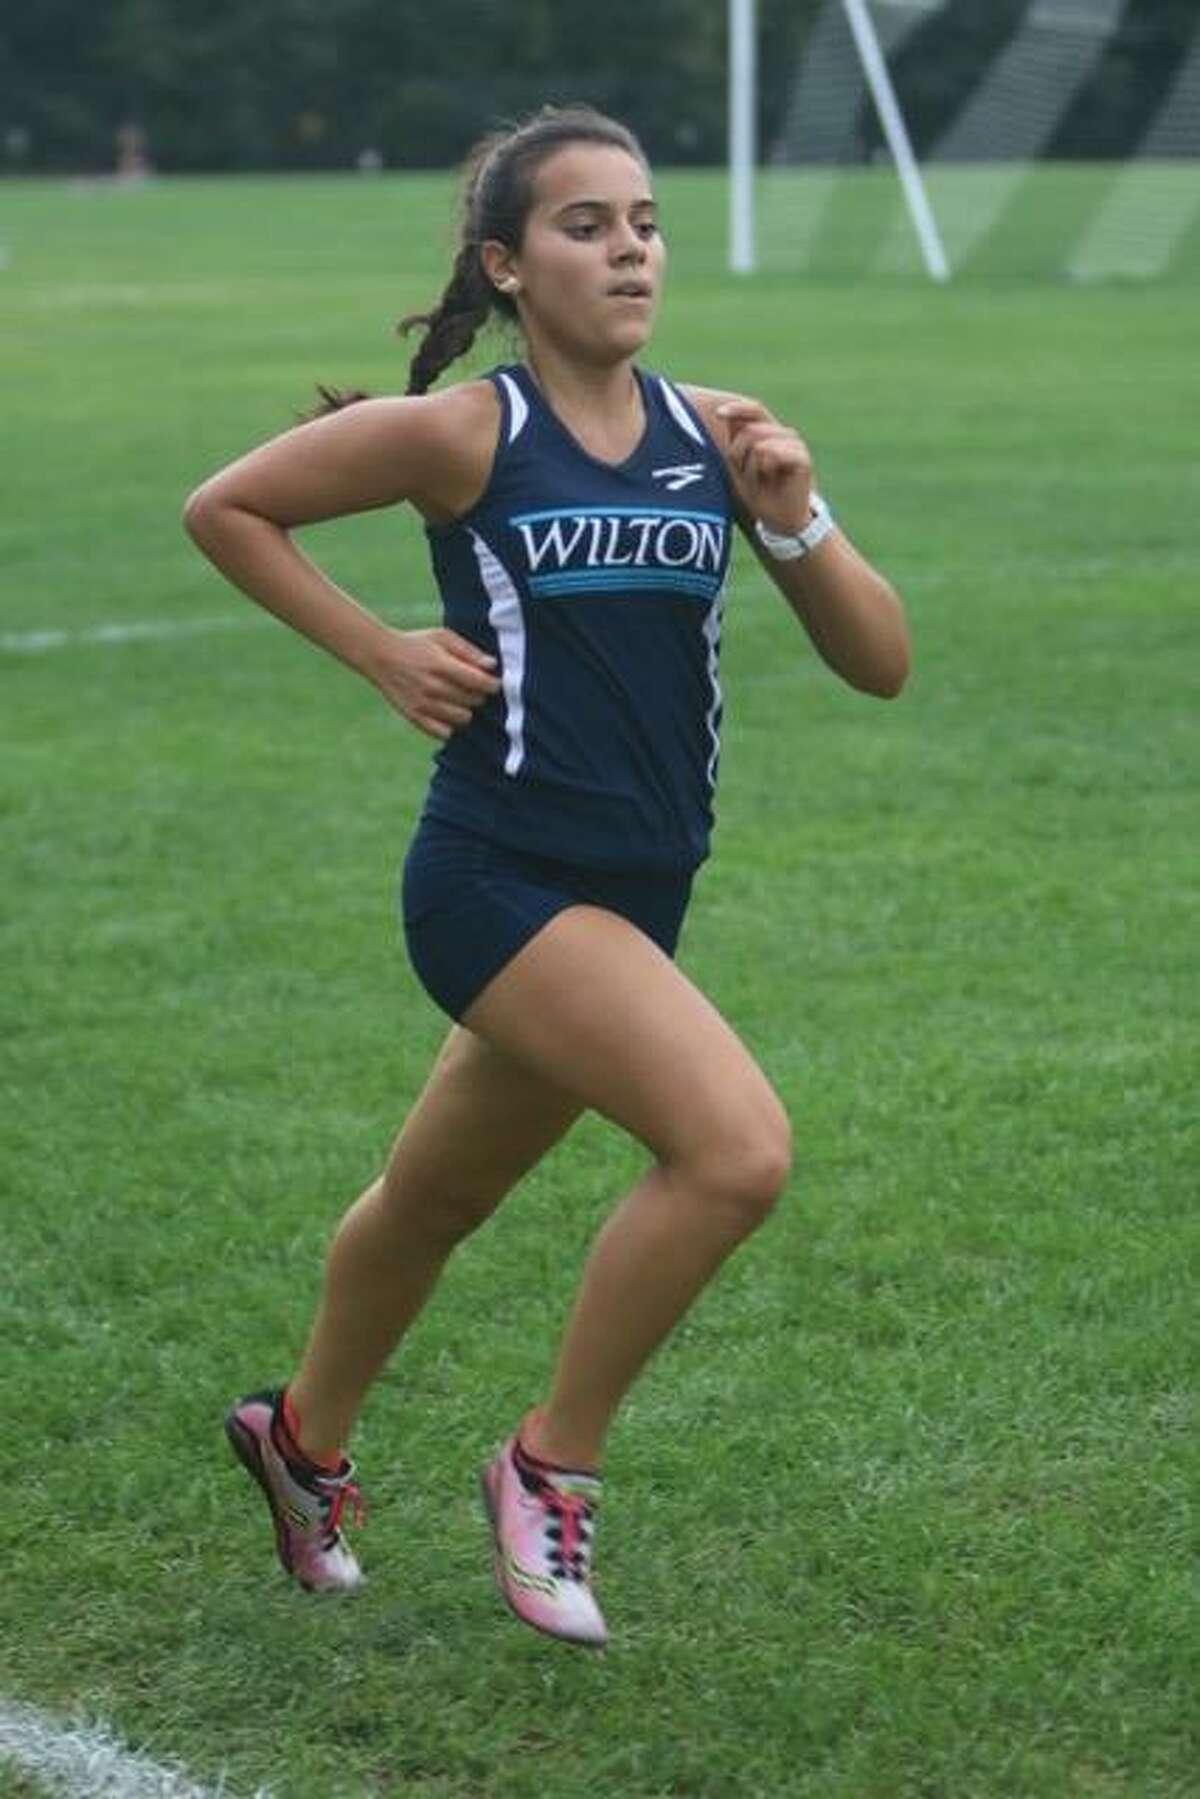 Paula Perez Pelaez runs a cross-country race for Wilton High School.